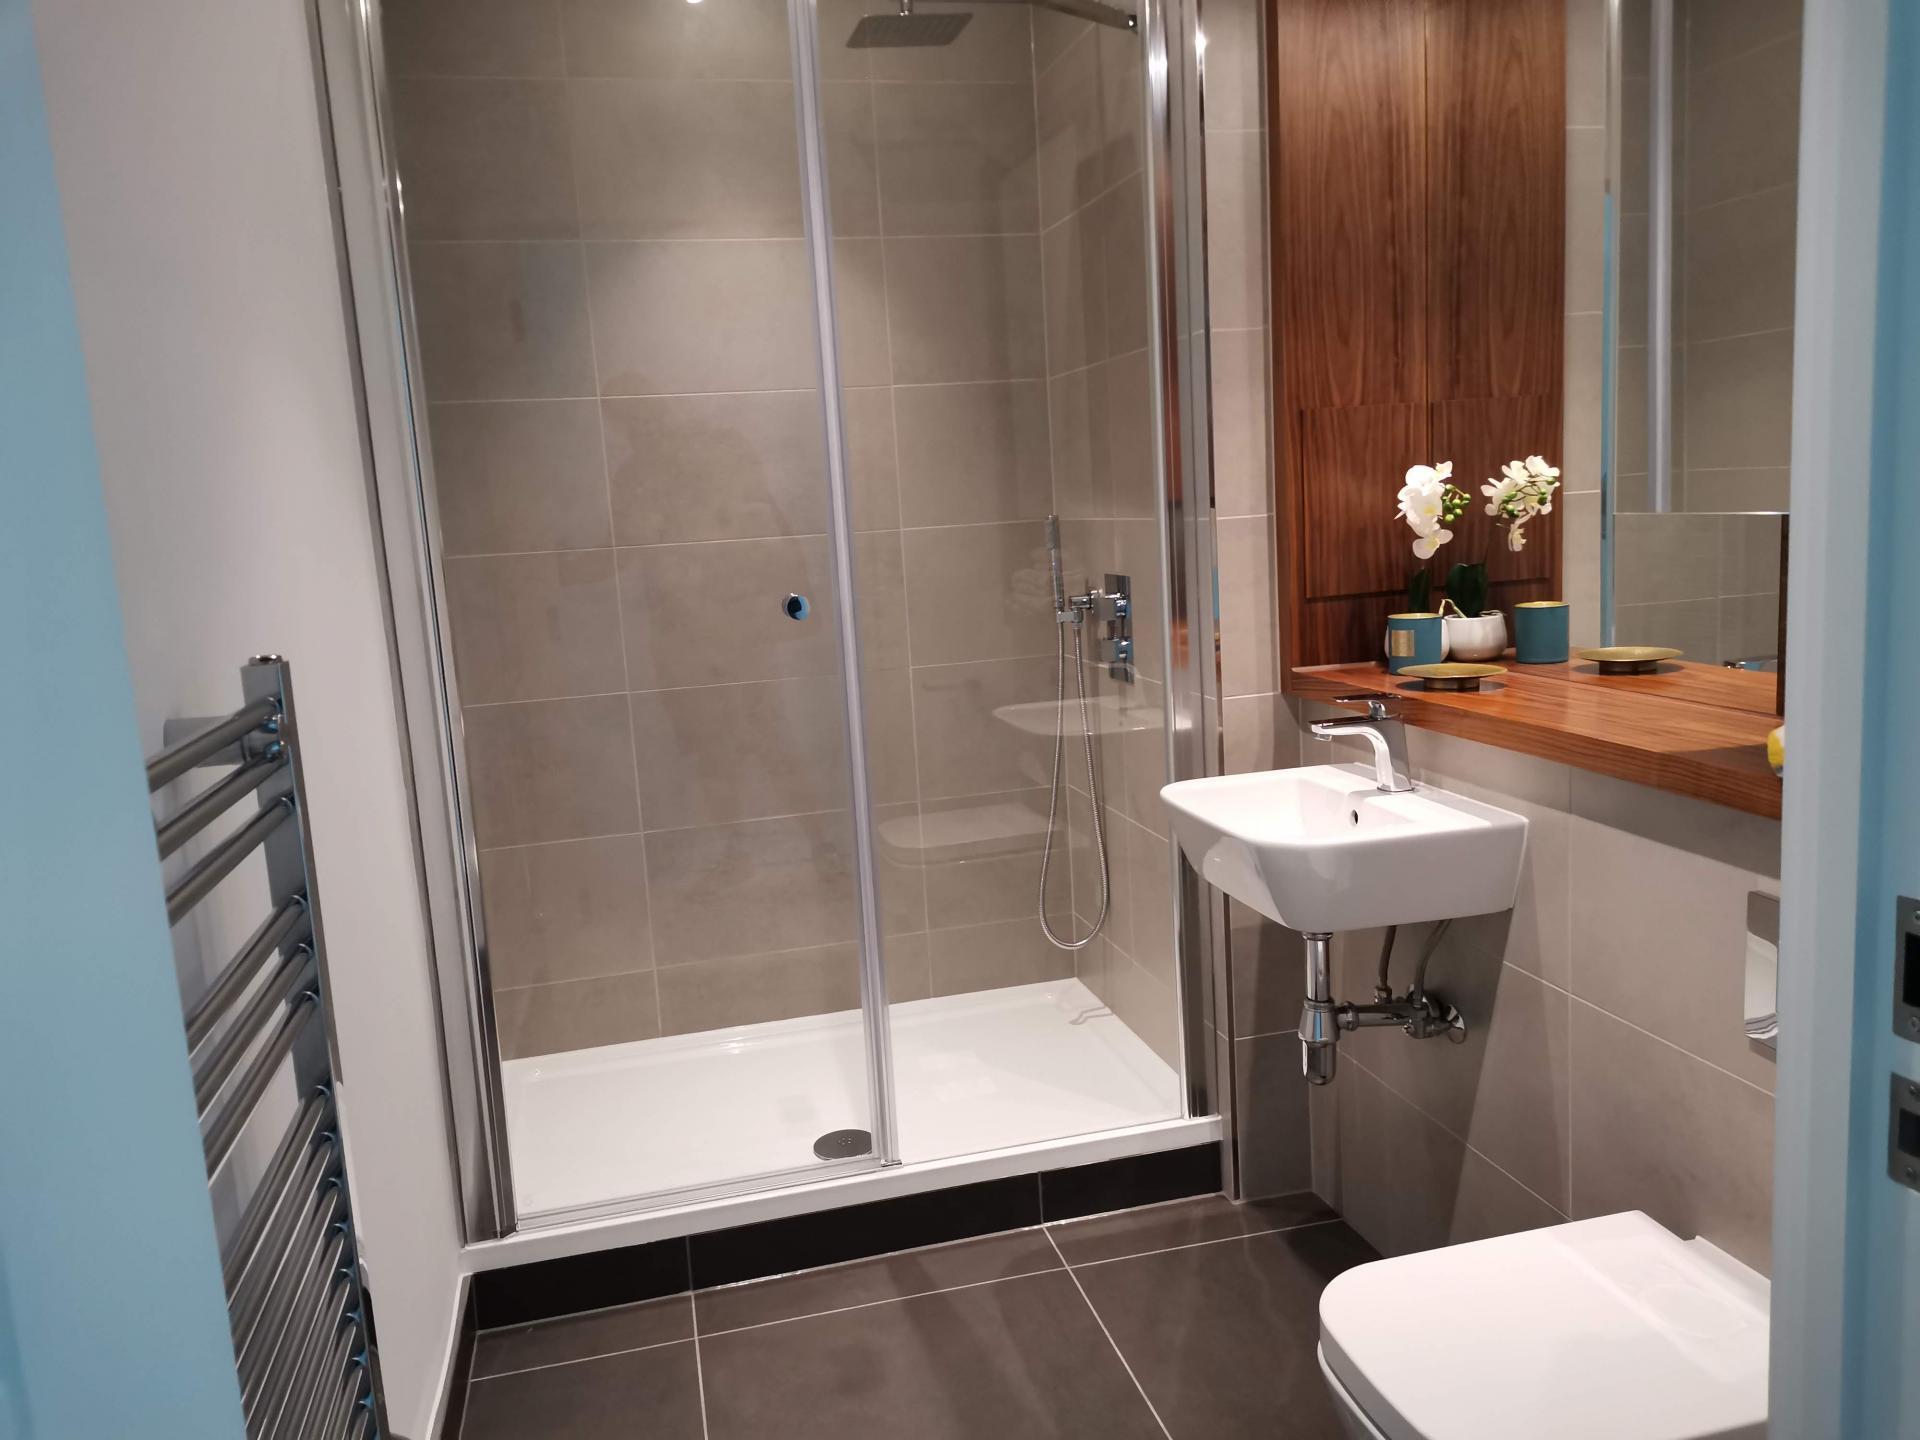 Bathroom at Charles Hope Canary Wharf, Canary Wharf, London - Citybase Apartments